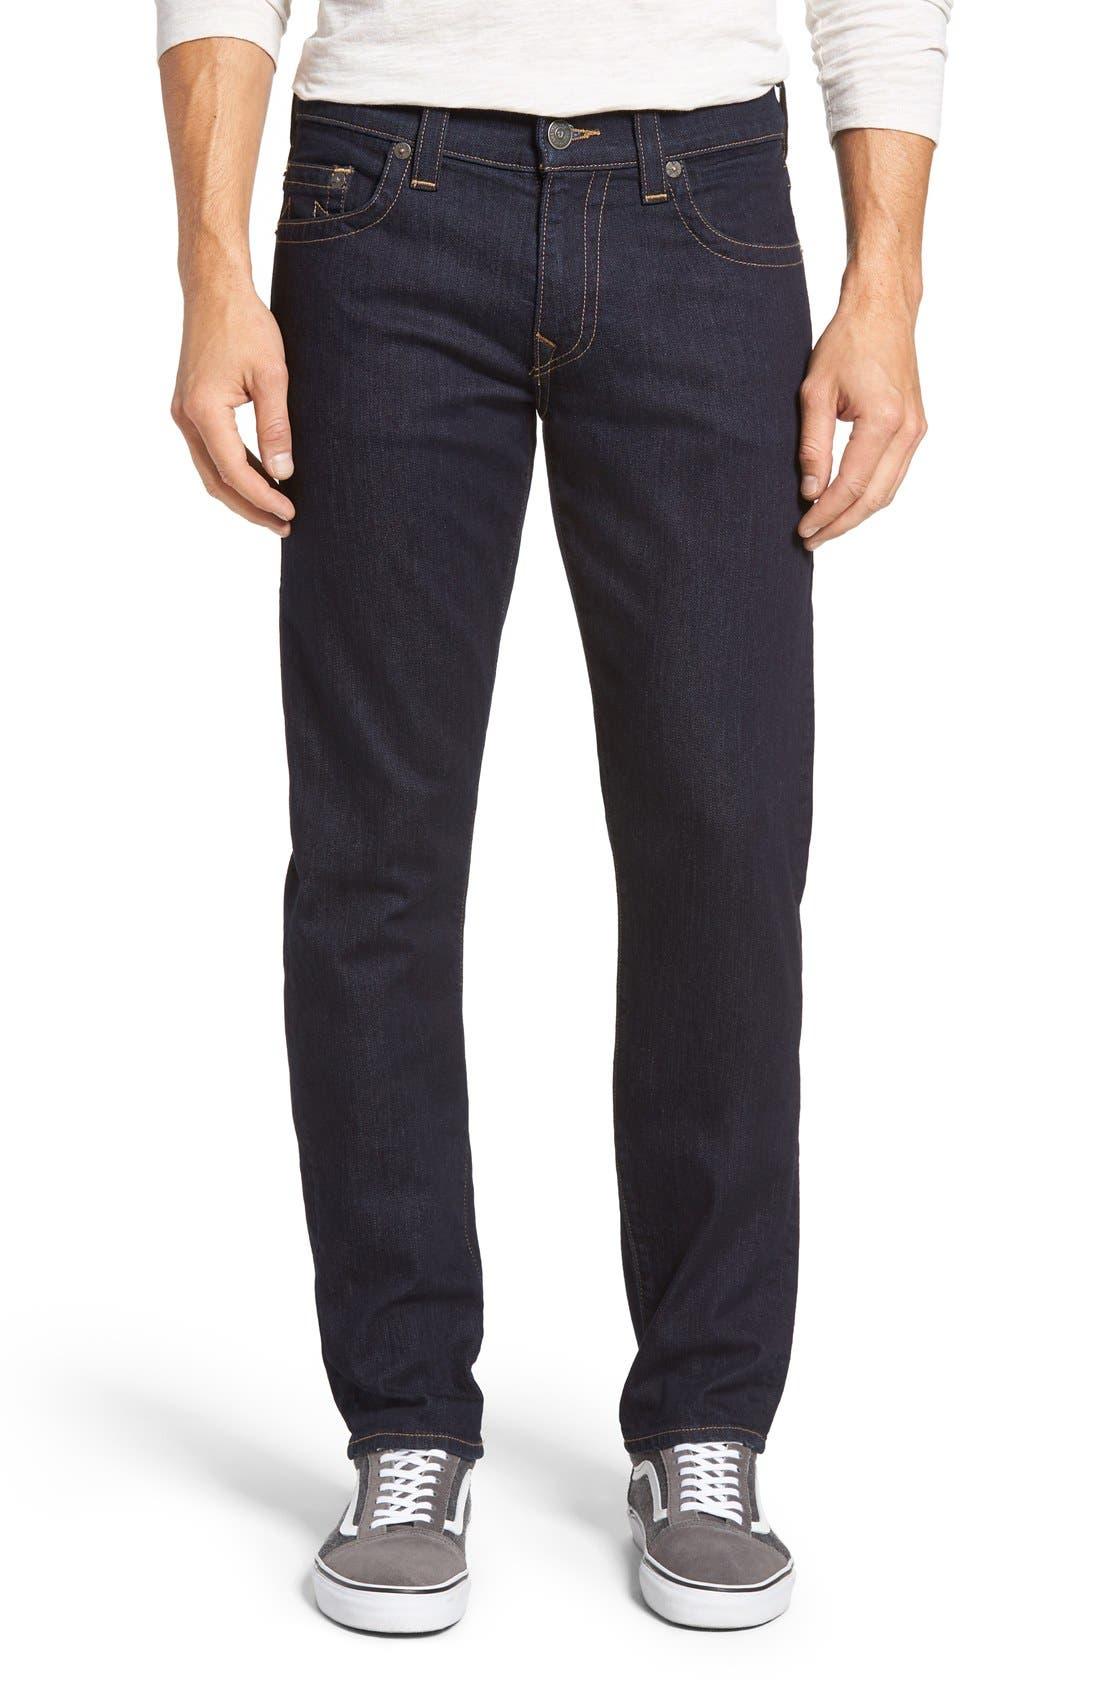 Main Image - True Religion Brand Jeans Geno Straight Leg Jeans (2S Body Rinse)